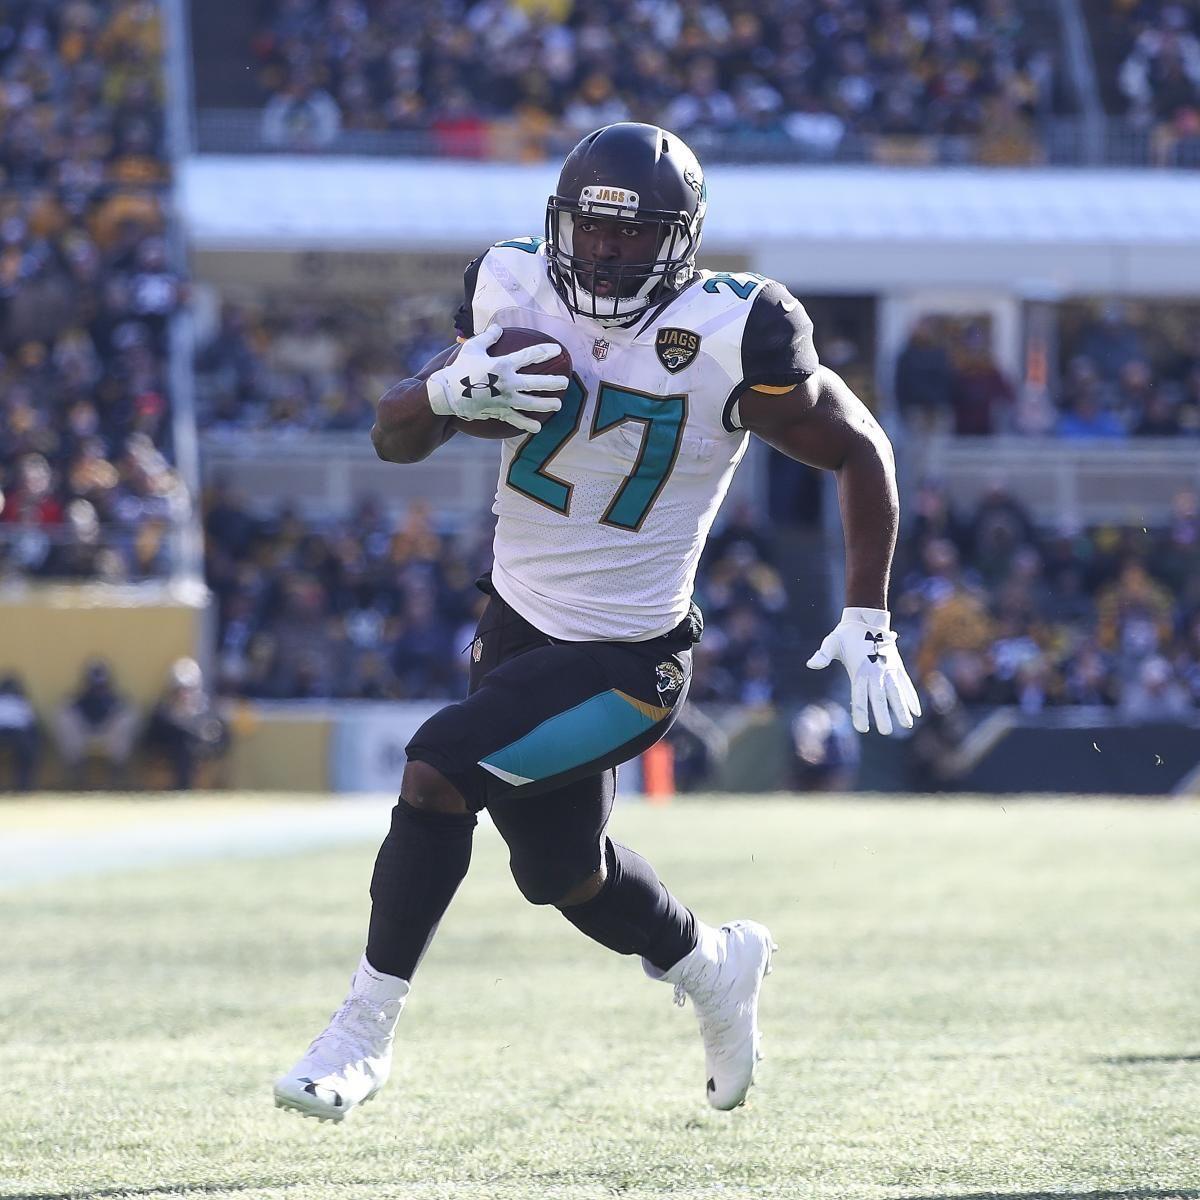 NFL Playoffs 2018 TV Info, Bracket Predictions and Super